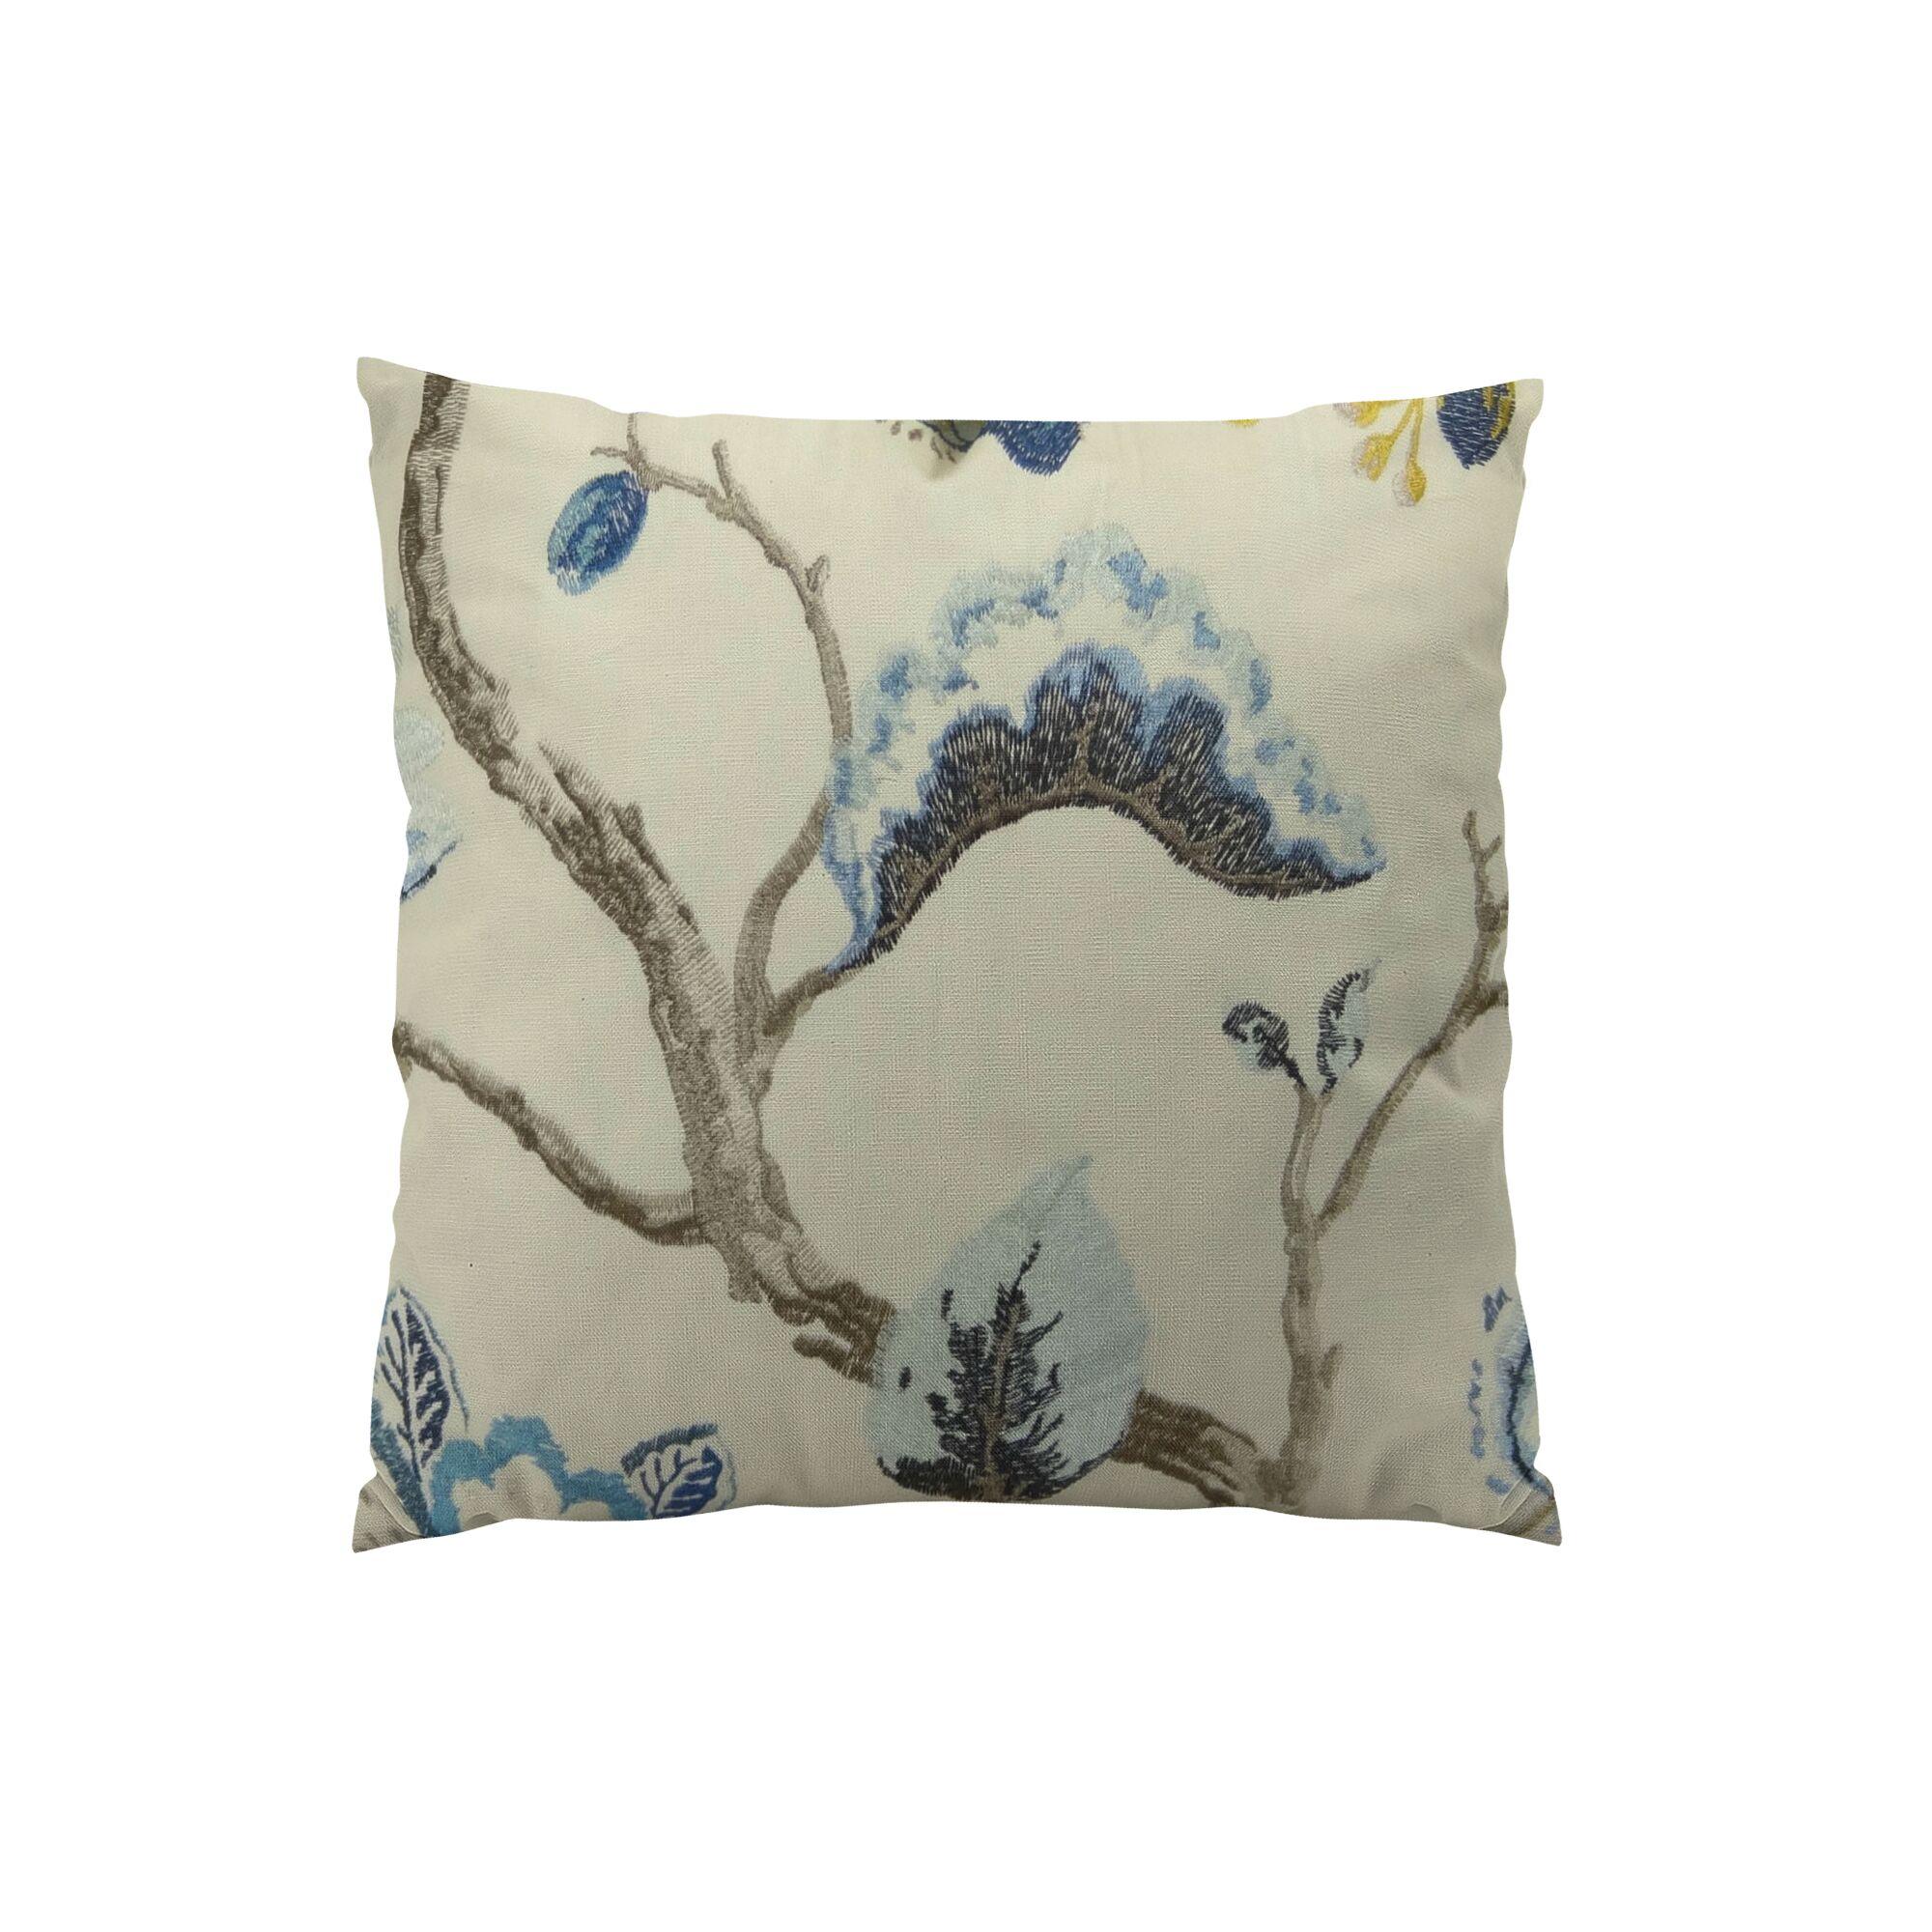 Bloom City Handmade Cotton Throw Pillow Size: 12